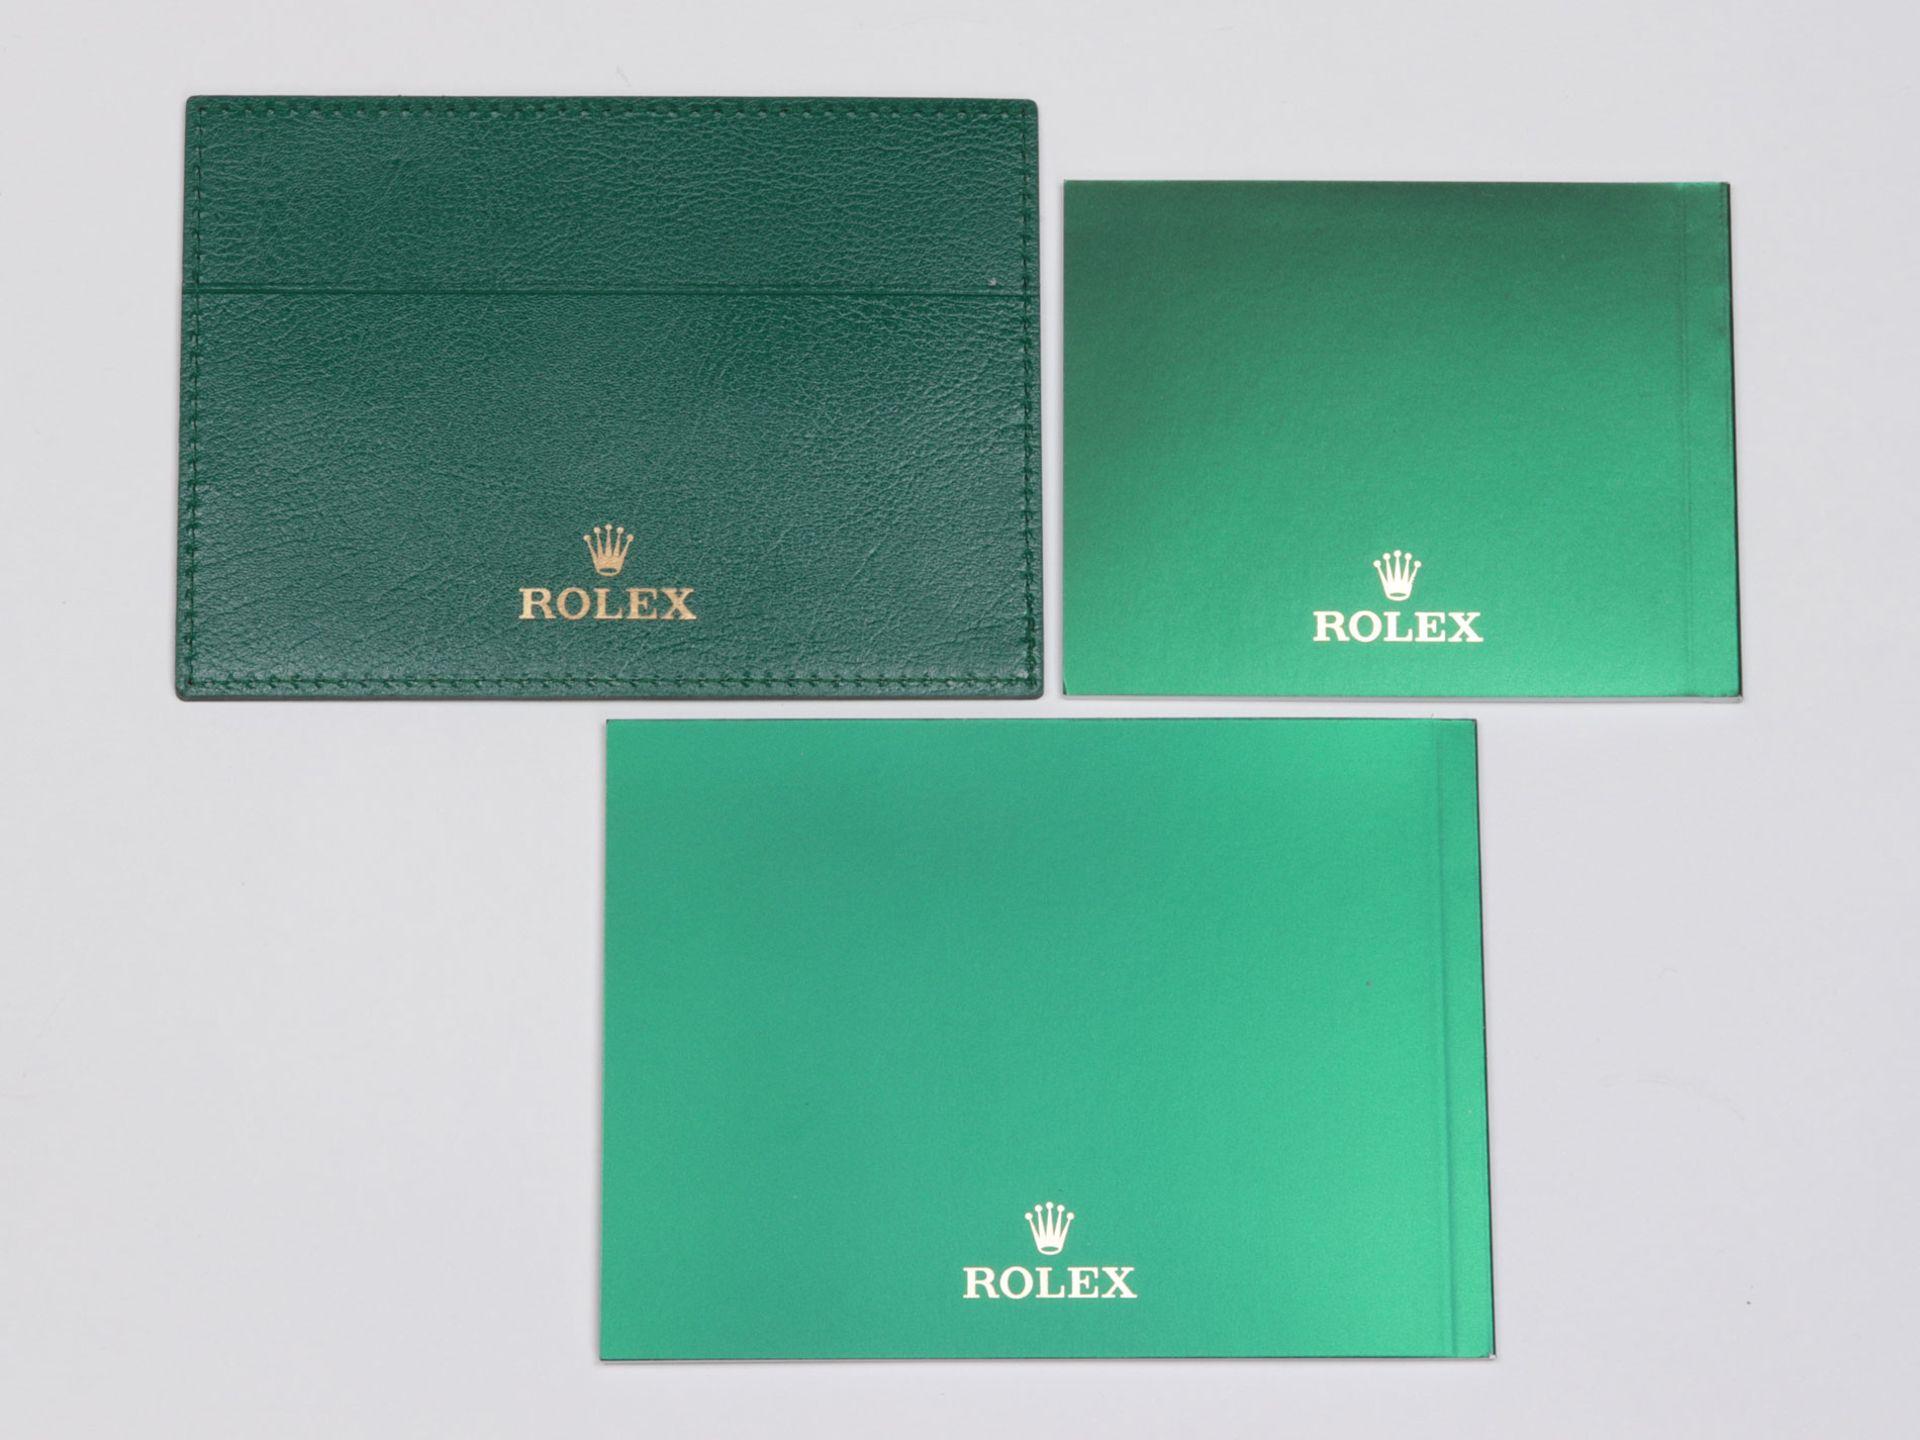 Rolex - Herrenarmbanduhr Roségold 750, Rolex Day-Date Oyster Perpetual, Superlative C - Image 11 of 17